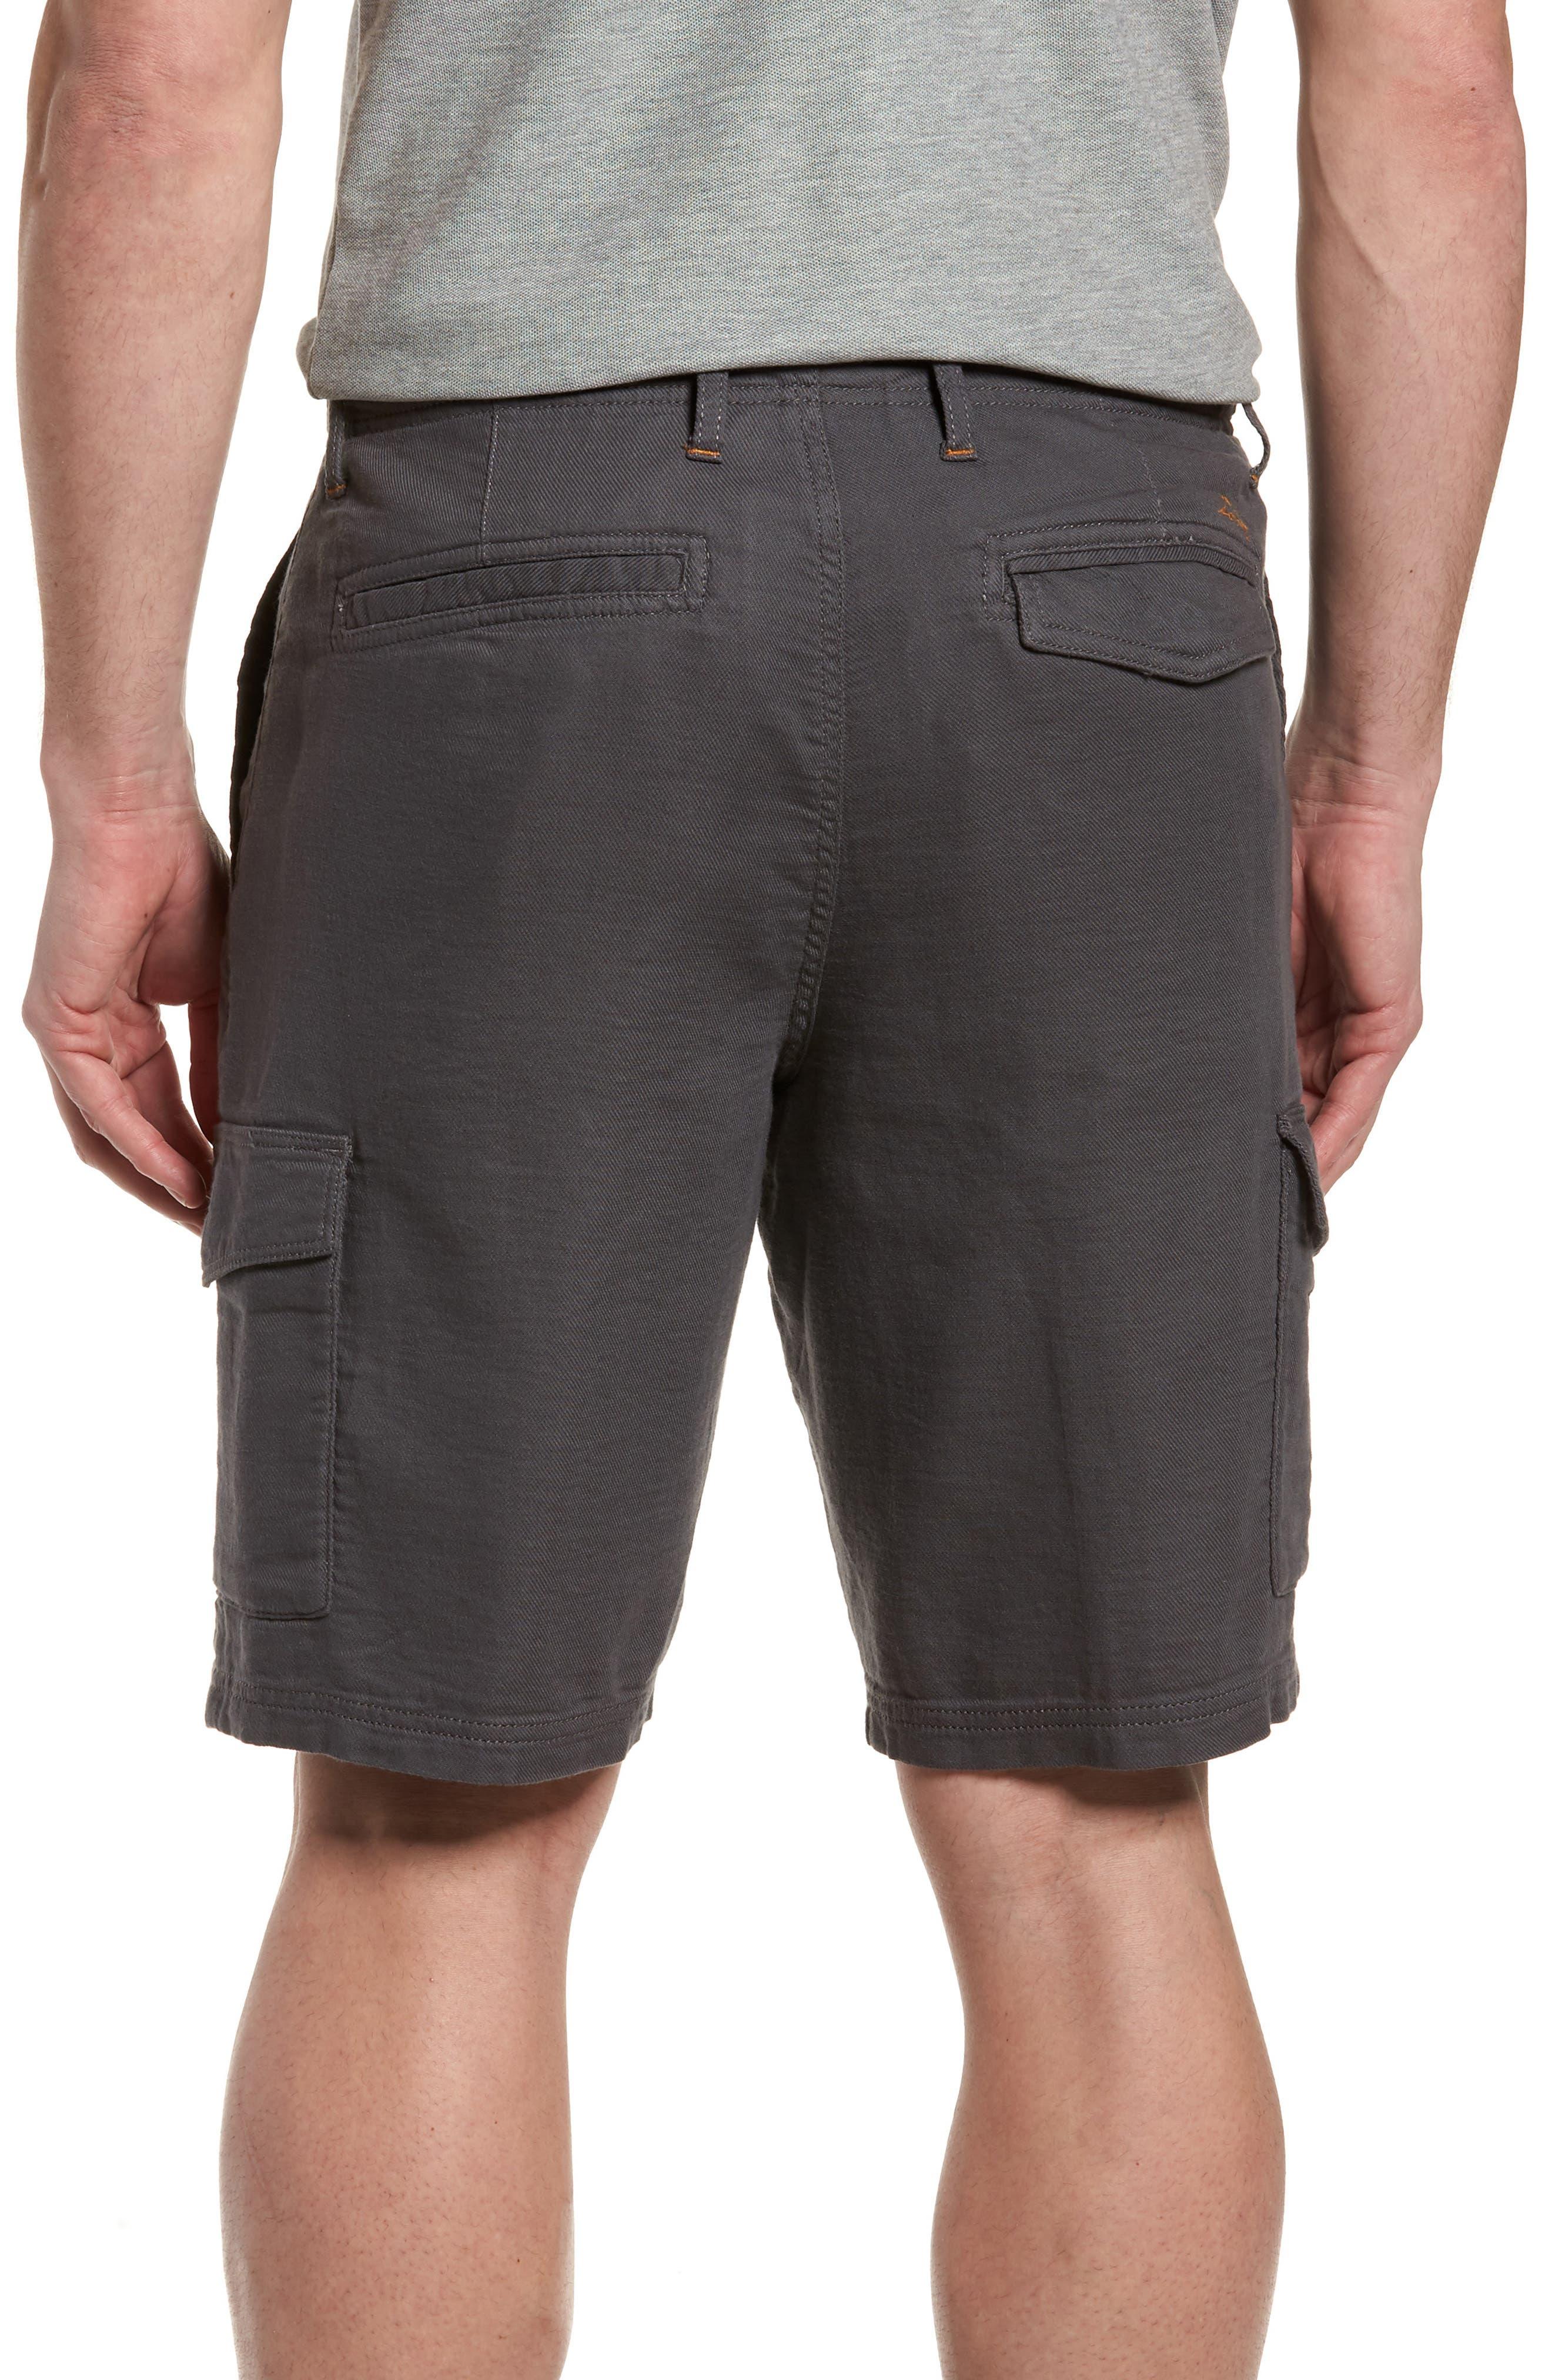 Edgewood Cargo Shorts,                             Alternate thumbnail 2, color,                             050